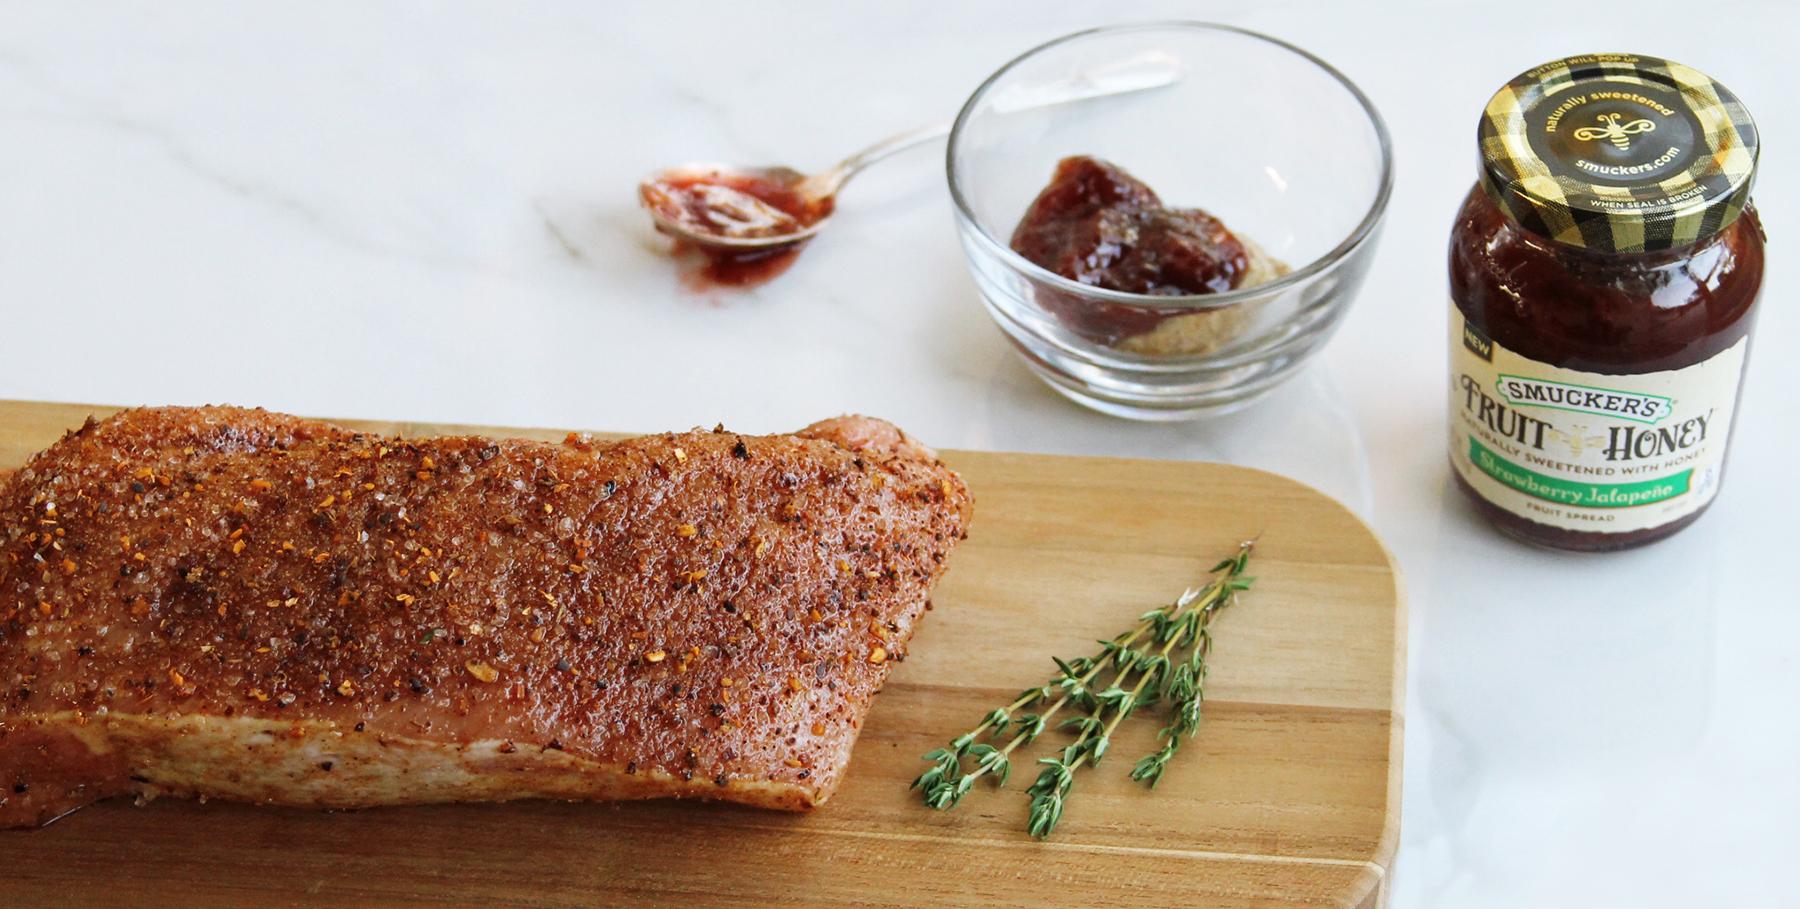 Strawberry jalapeno glazed pork tenderloin